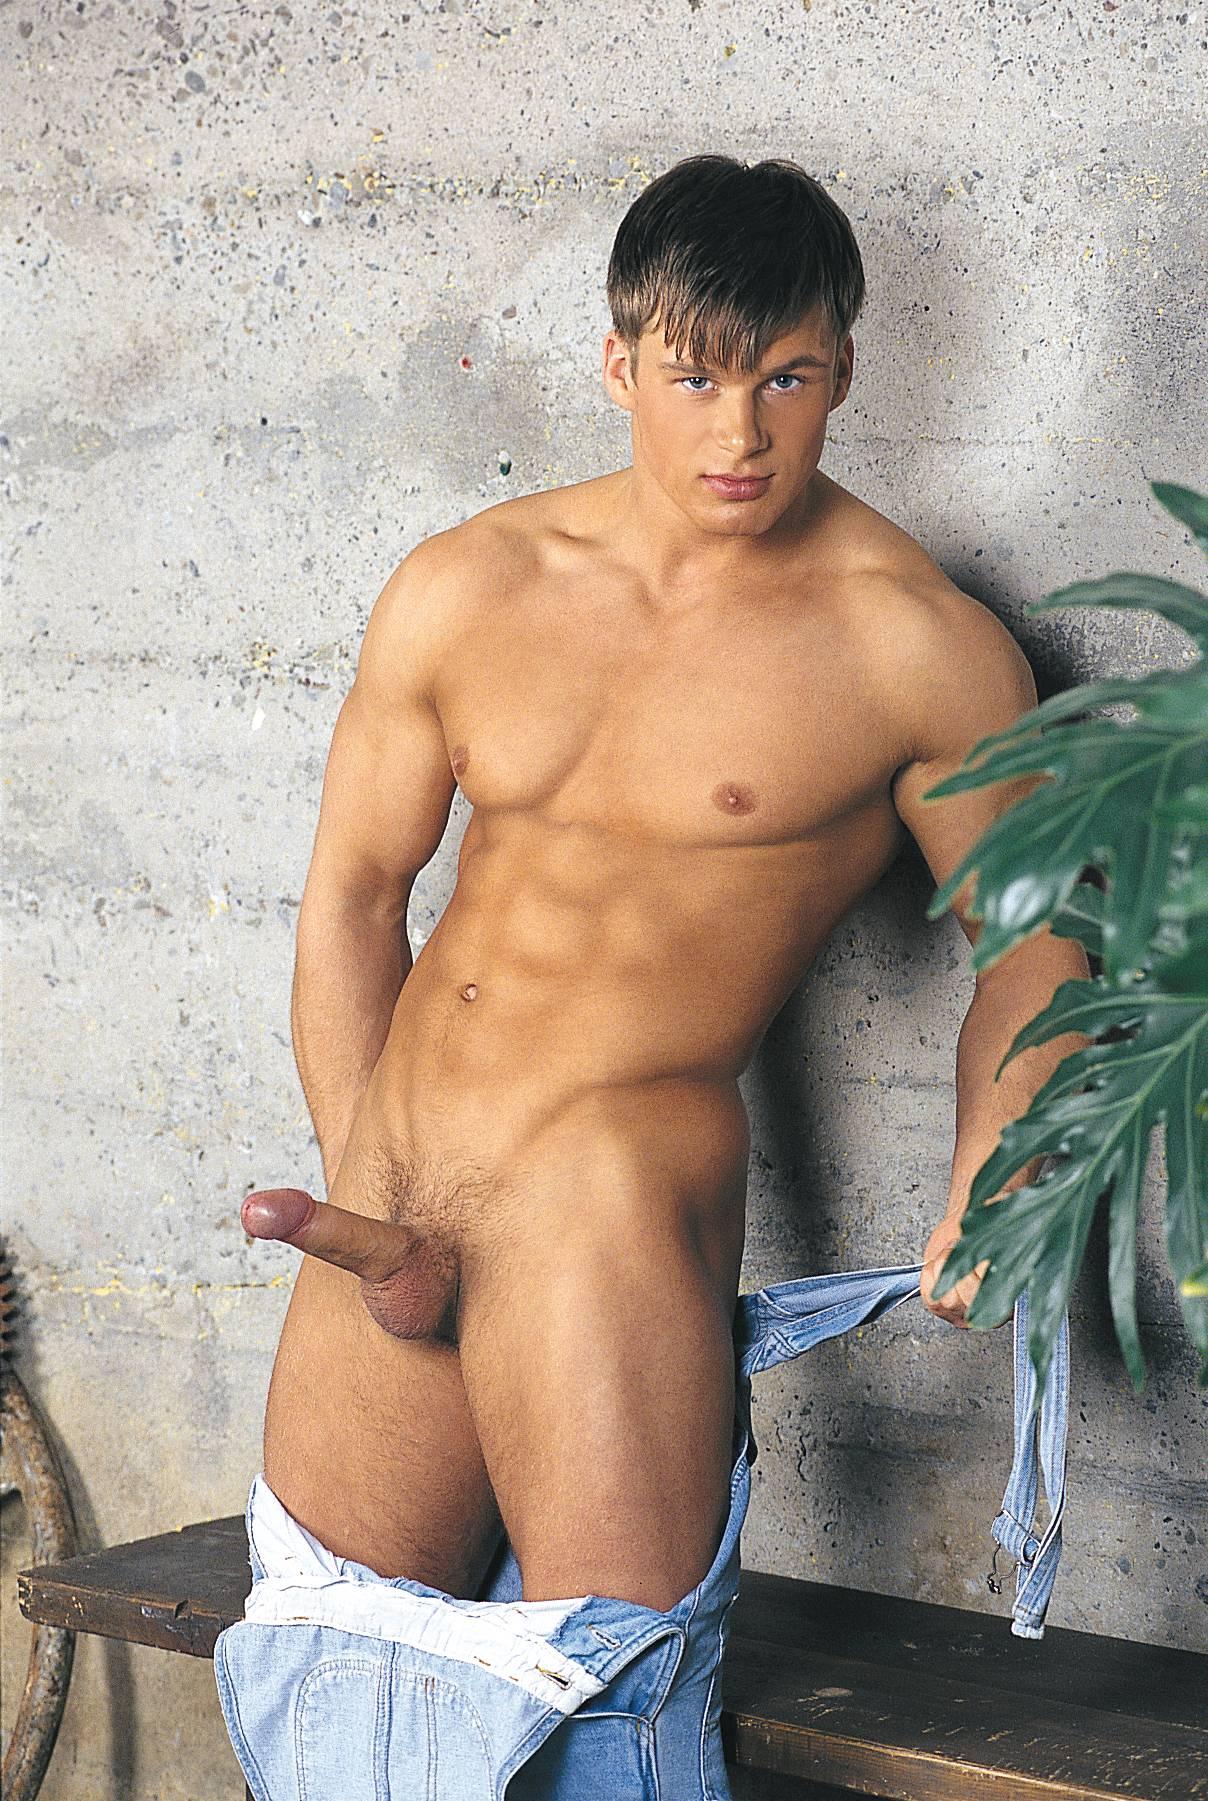 Порно фото голых молодых мужчин, зрелую леди ебут в большую жопу